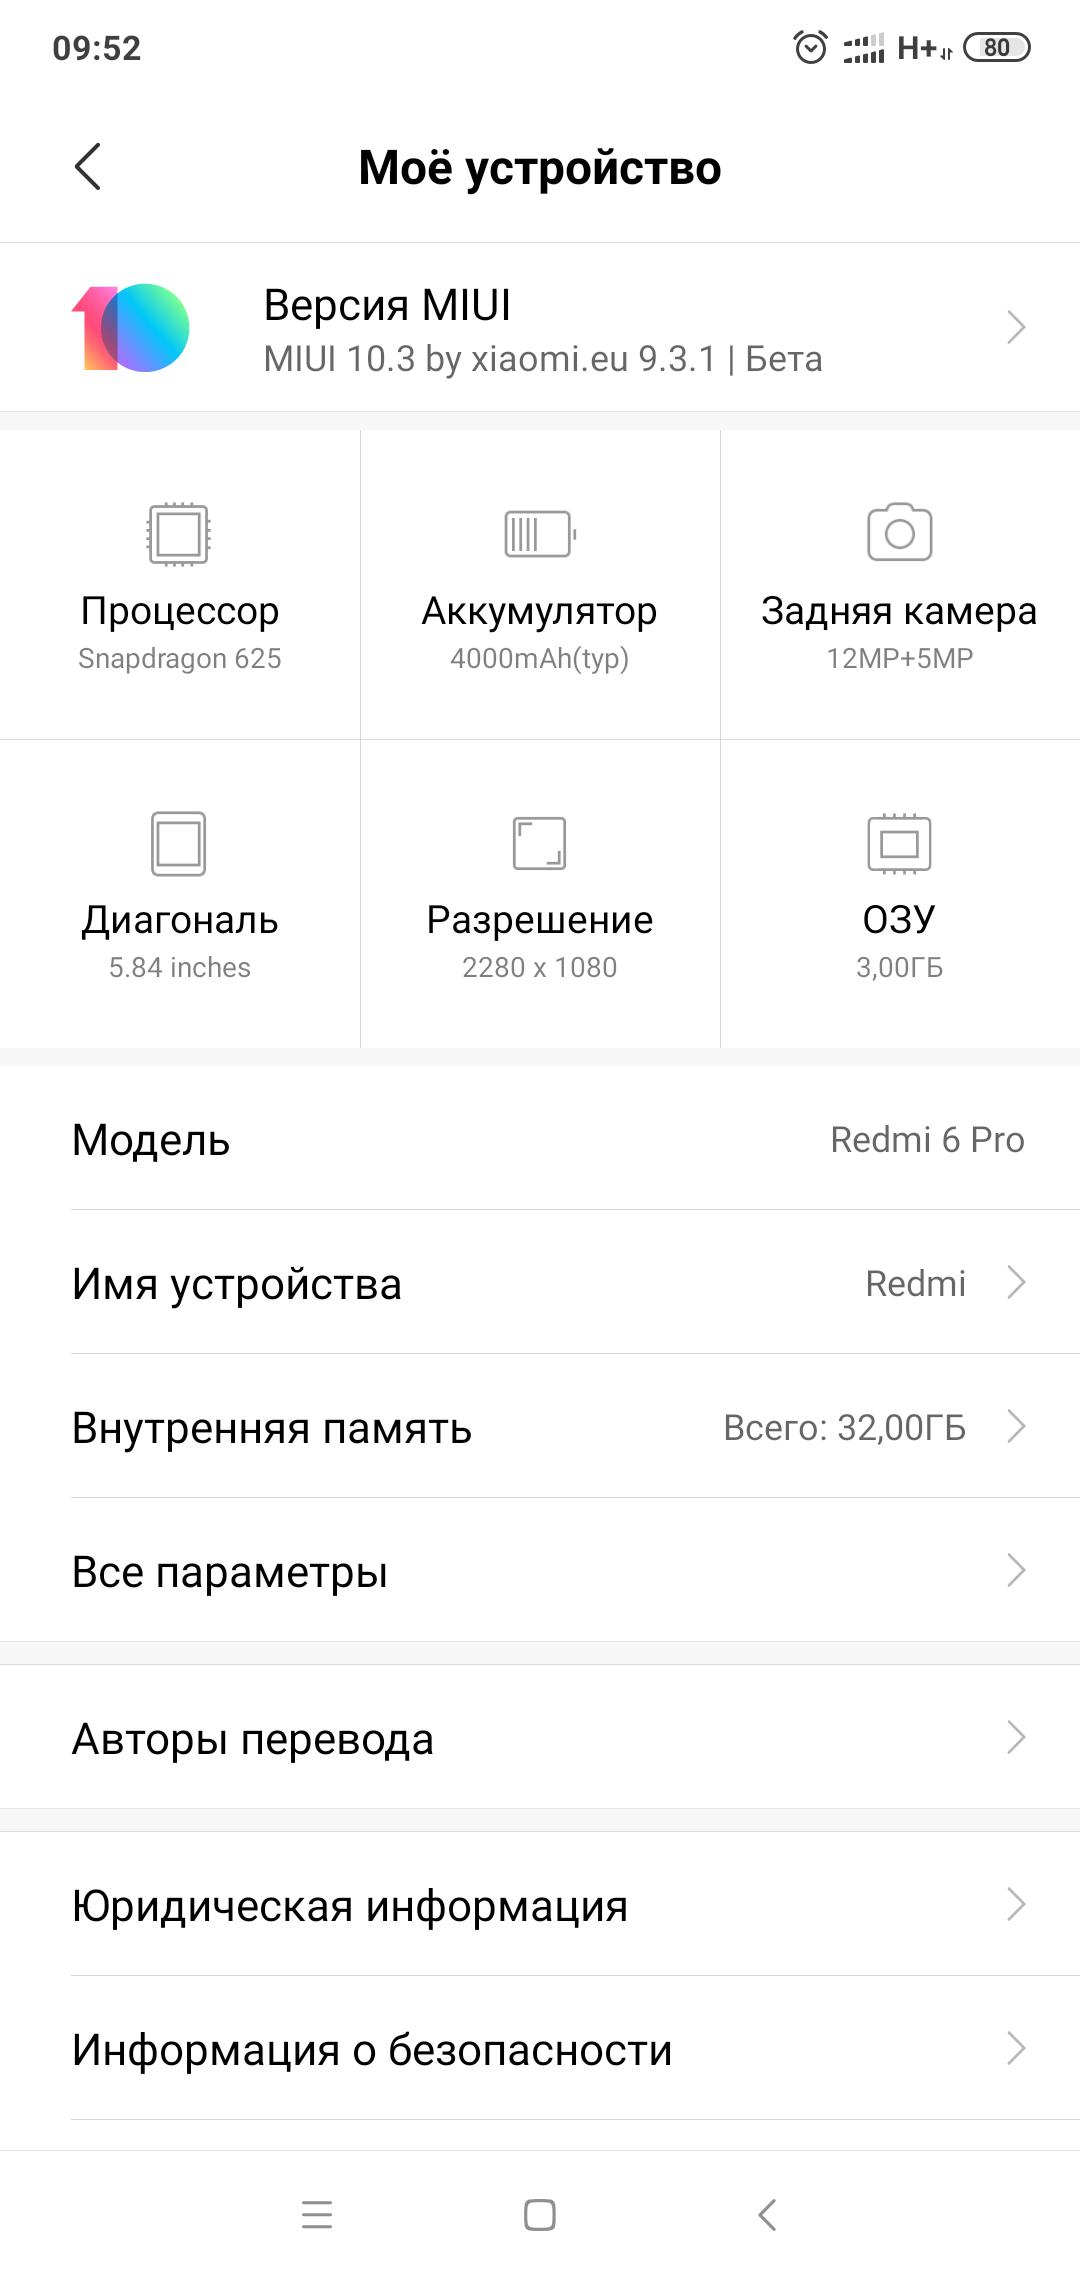 Screenshot_2019-03-05-09-52-38-909_com.android.settings.png